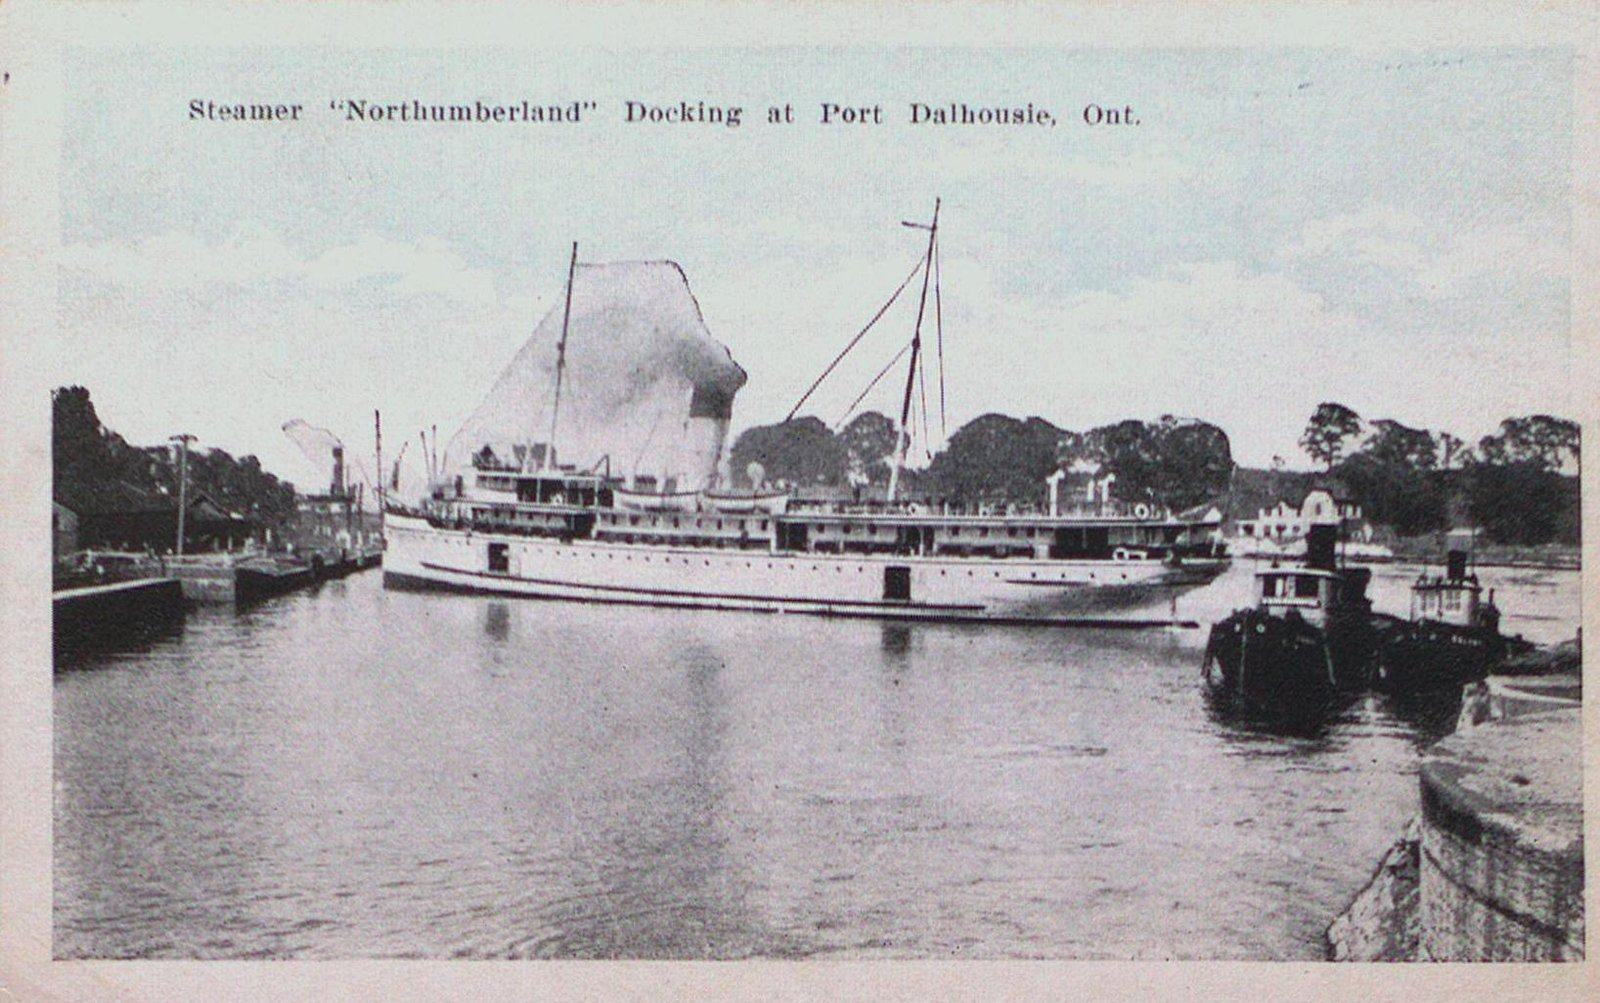 Steamer Northumberland Docking at Port Dalhousie